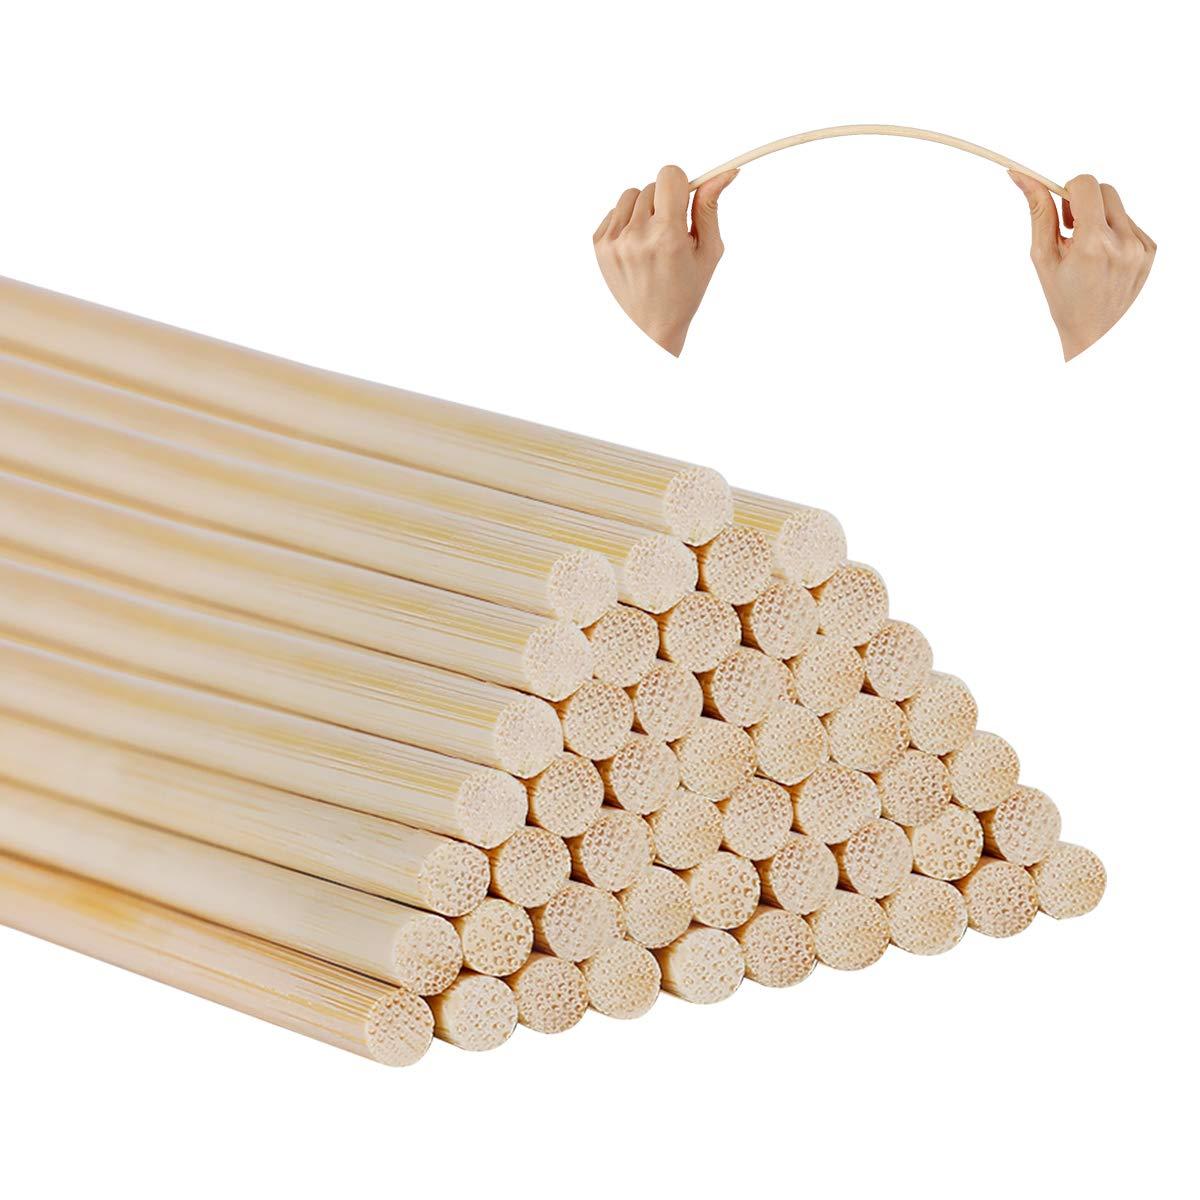 Woodcraft Sticks,Aieve 50 Pack 12 Inch Long Bamboo Dowel Rods Craft Sticks for